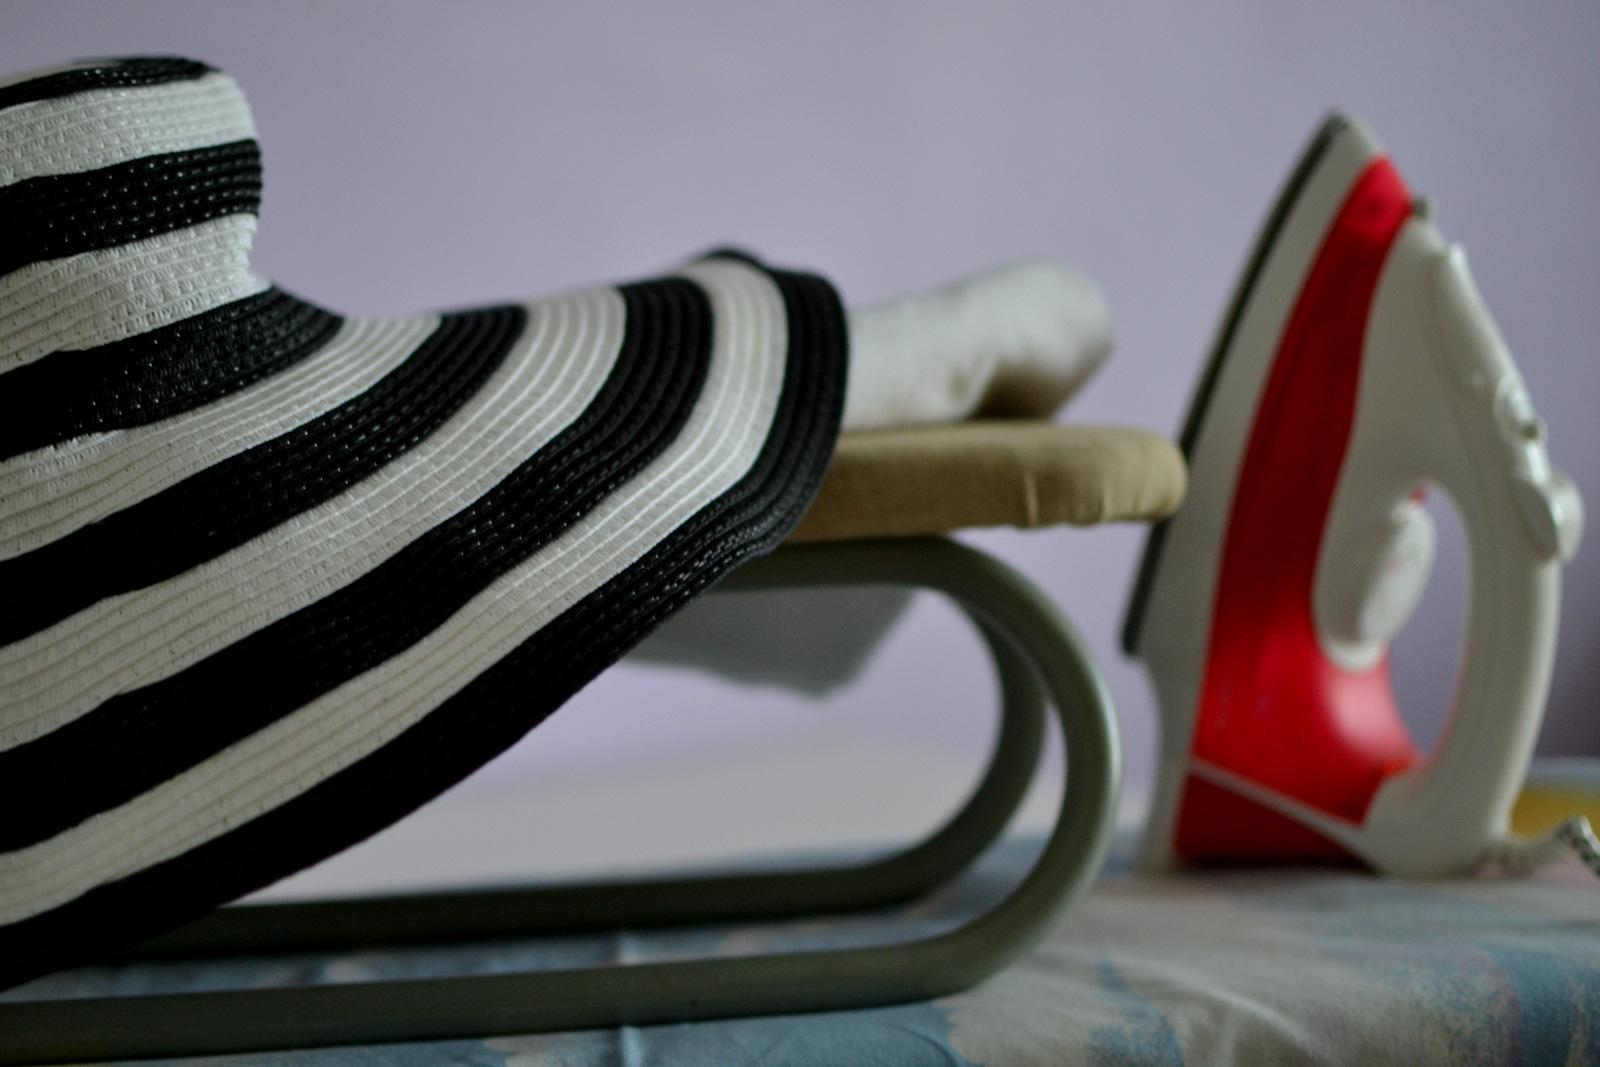 how to flatten a hat